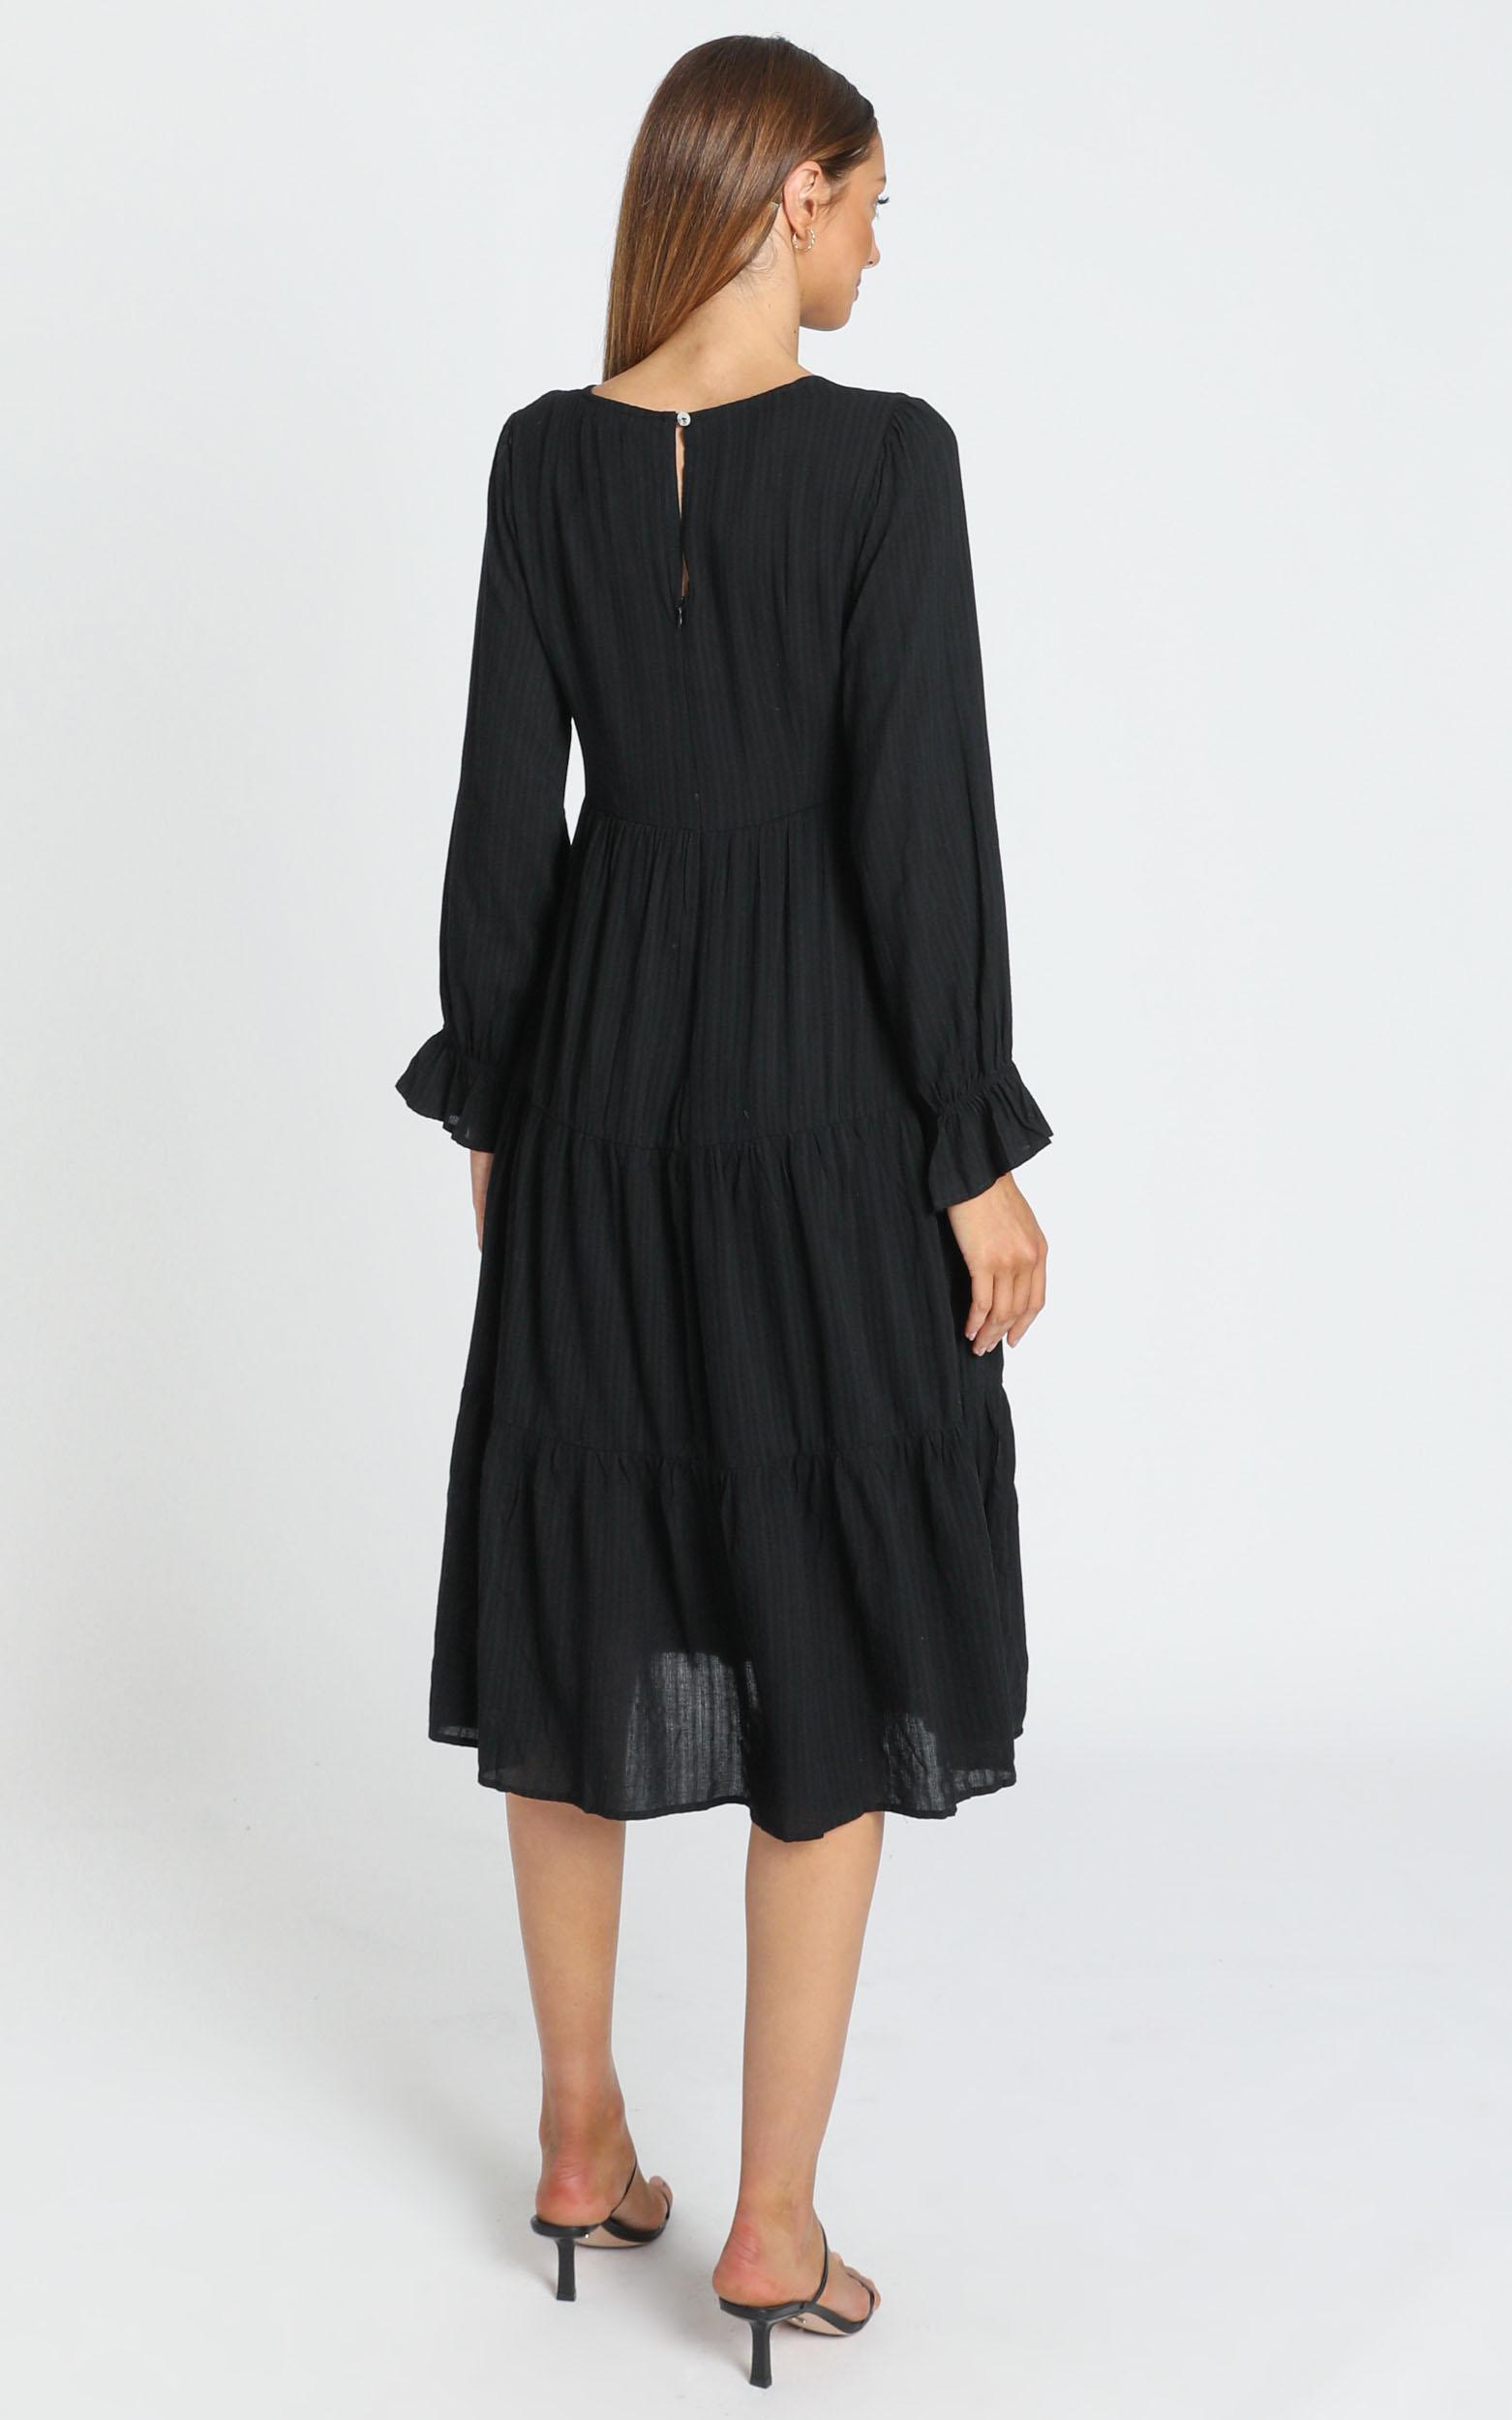 Evanna Dress in Black - 6 (XS), Black, hi-res image number null